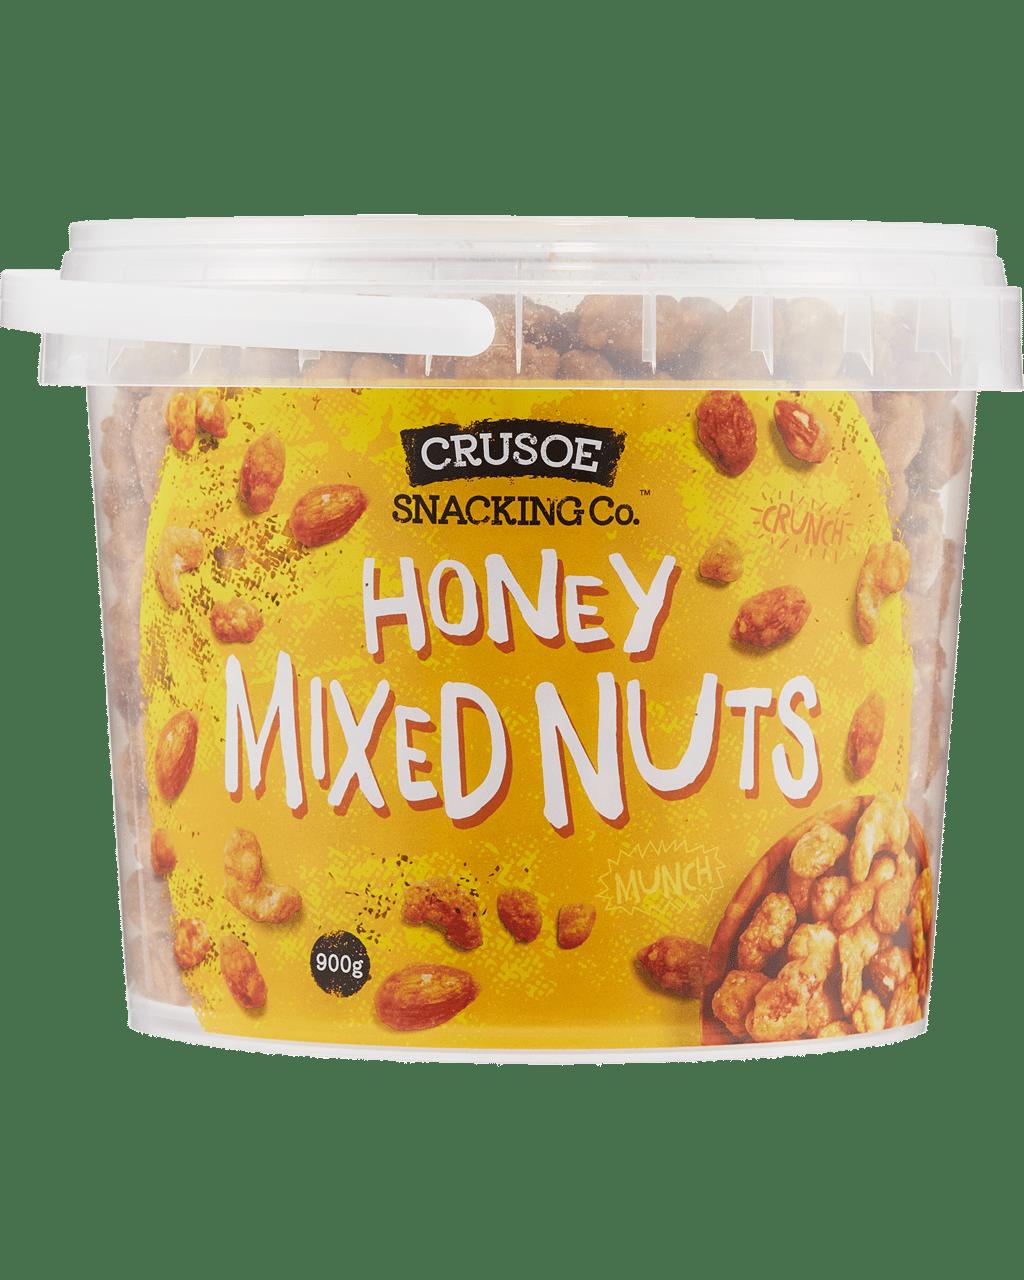 6b2fab234f6b Crusoe Snacking Co. Honey Mixed Nuts 900g